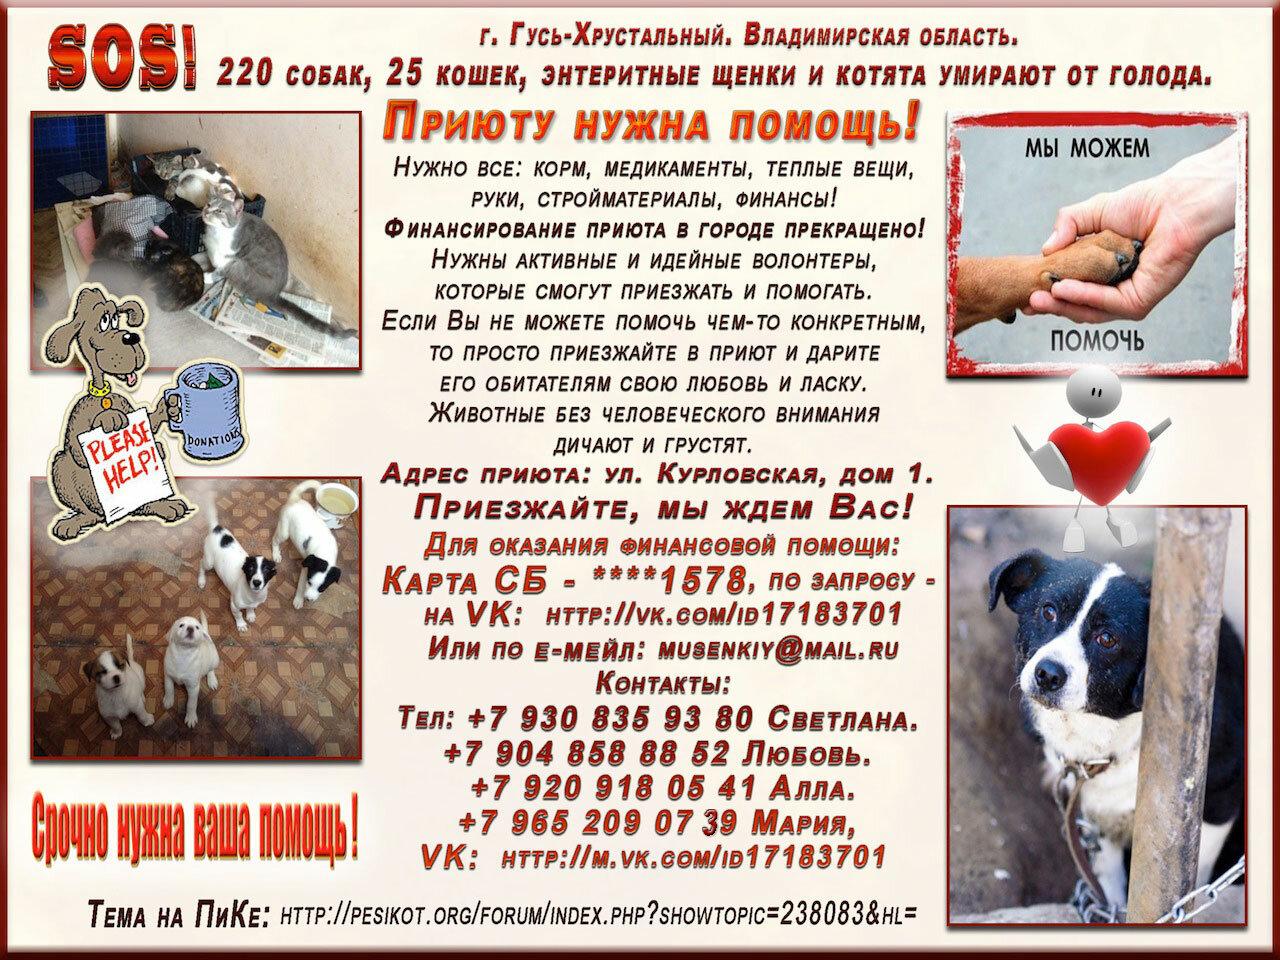 220 собак, 25 кошек, щенки и котята в приюте умирают от голода.